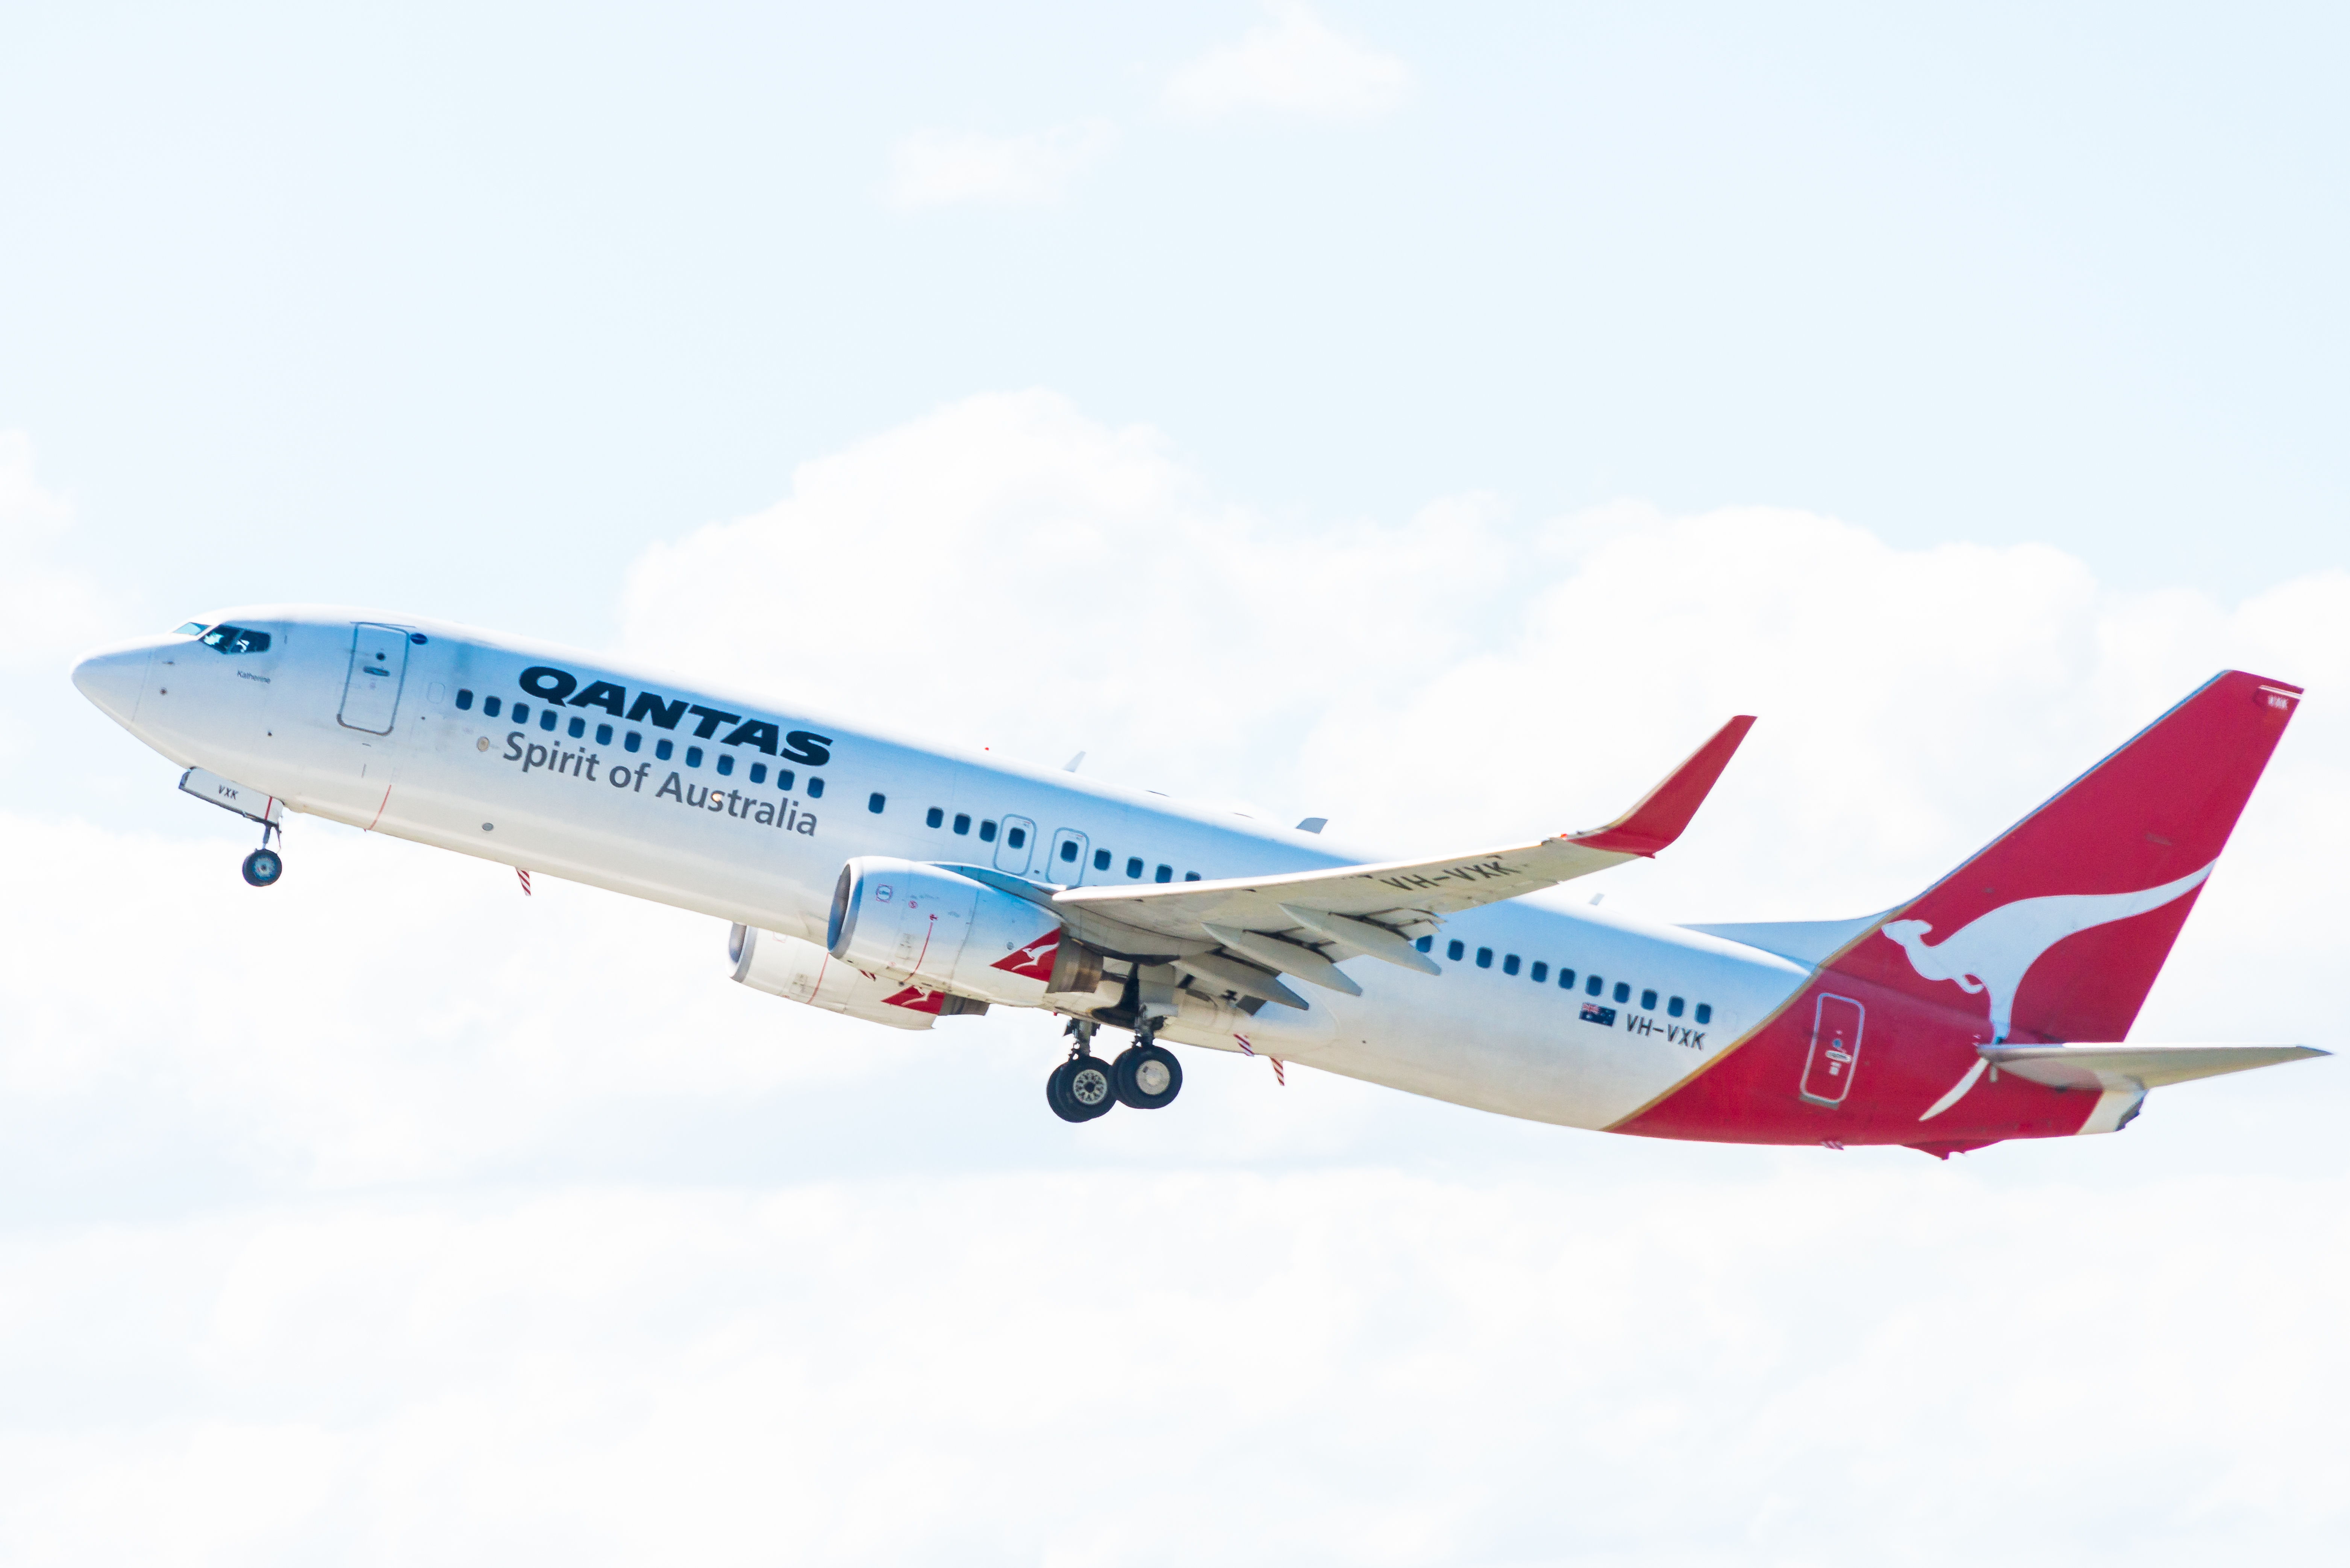 Qantas signs new distribution agreement